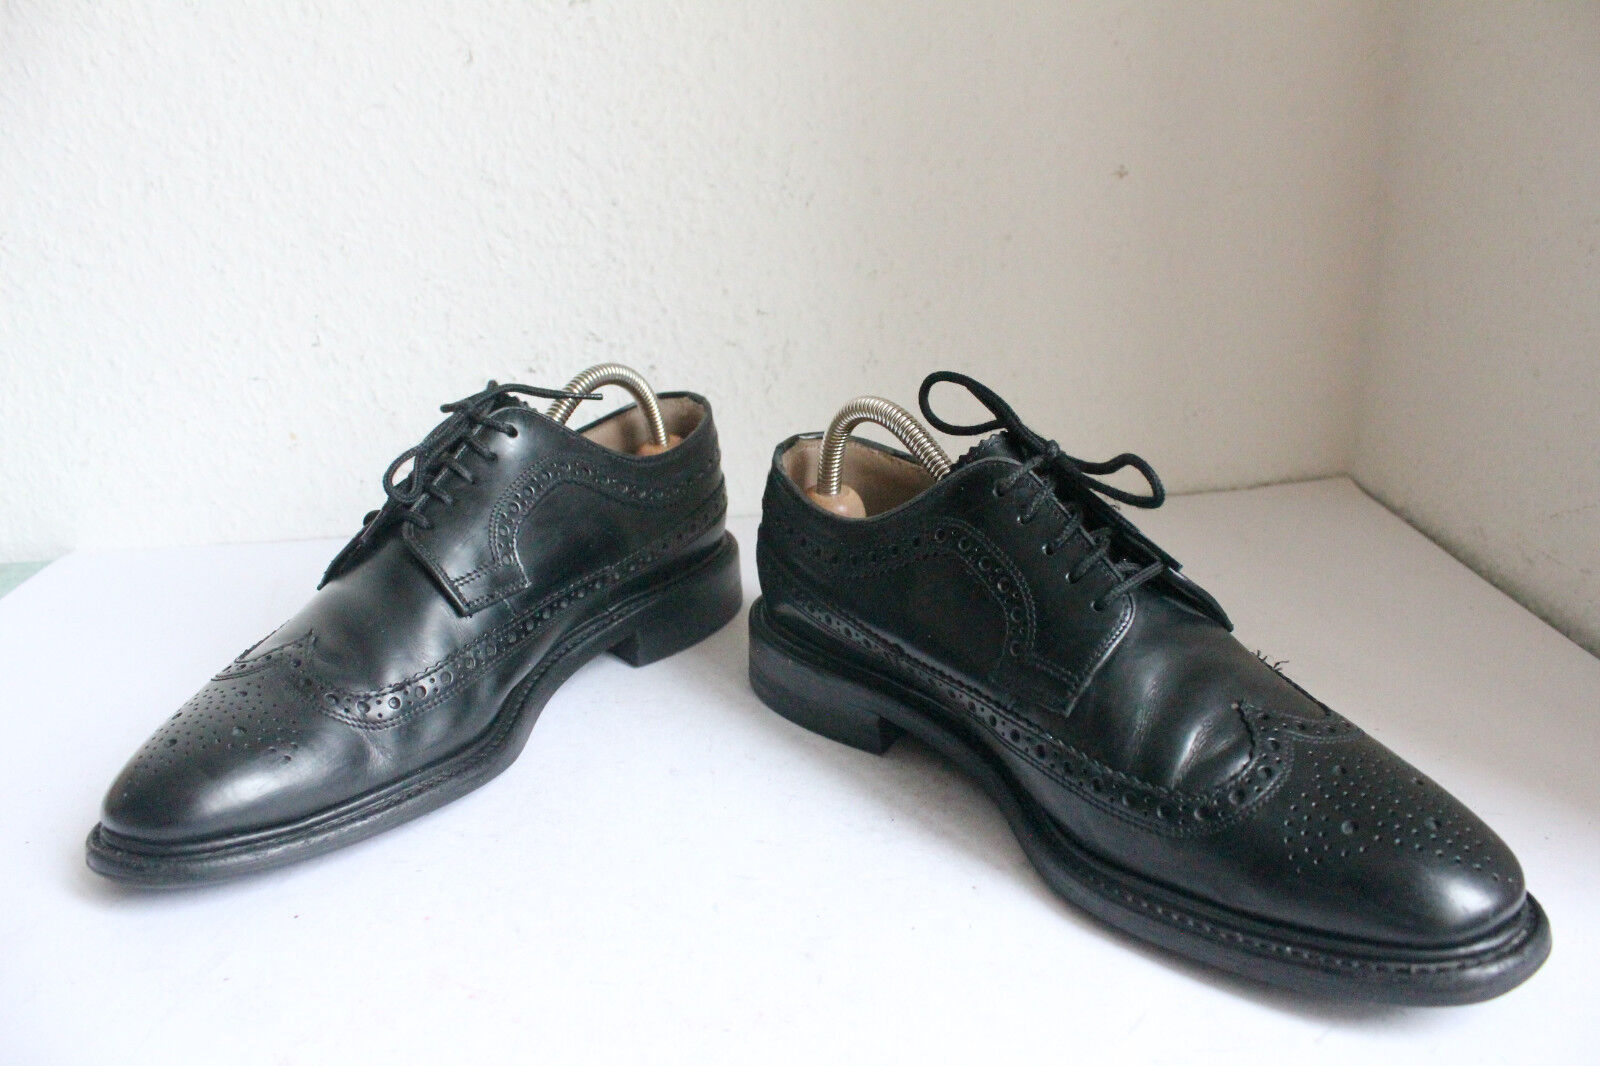 Charles Tyrwhitt dall'Inghilterra Budapester Scarpe in Vera Pelle Nero eu:42, 5-uk:8,5 Scarpe classiche da uomo